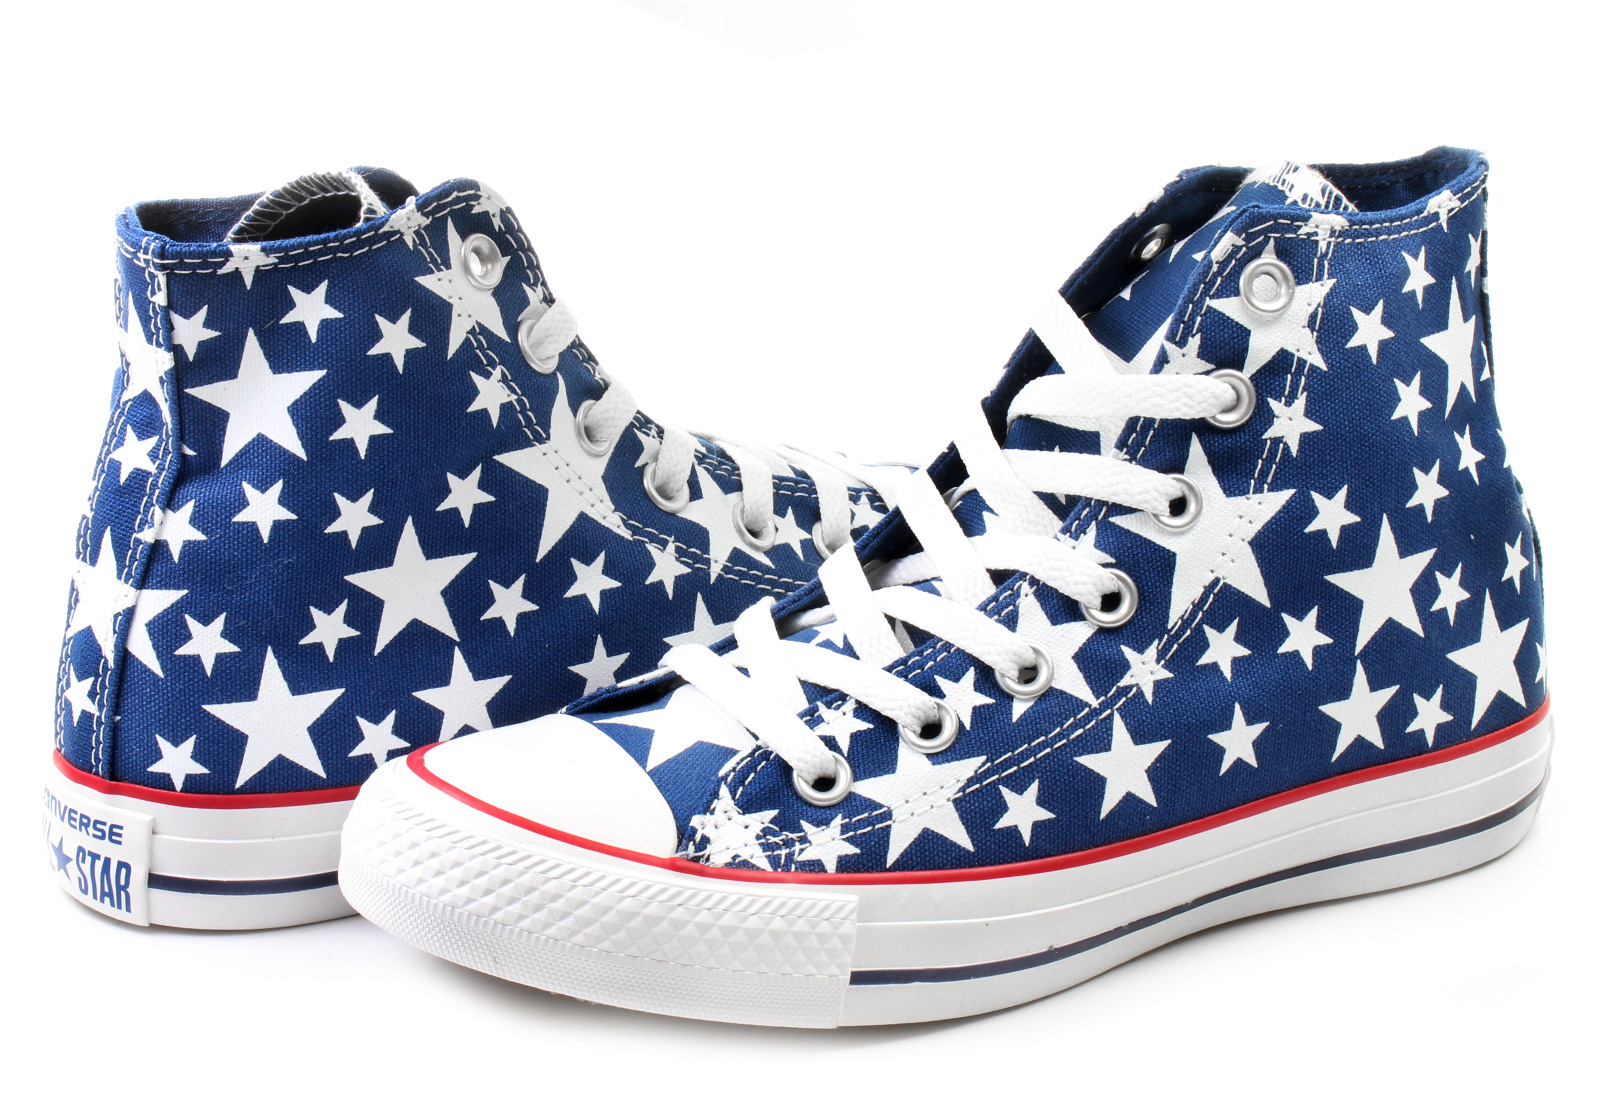 converse all star stars